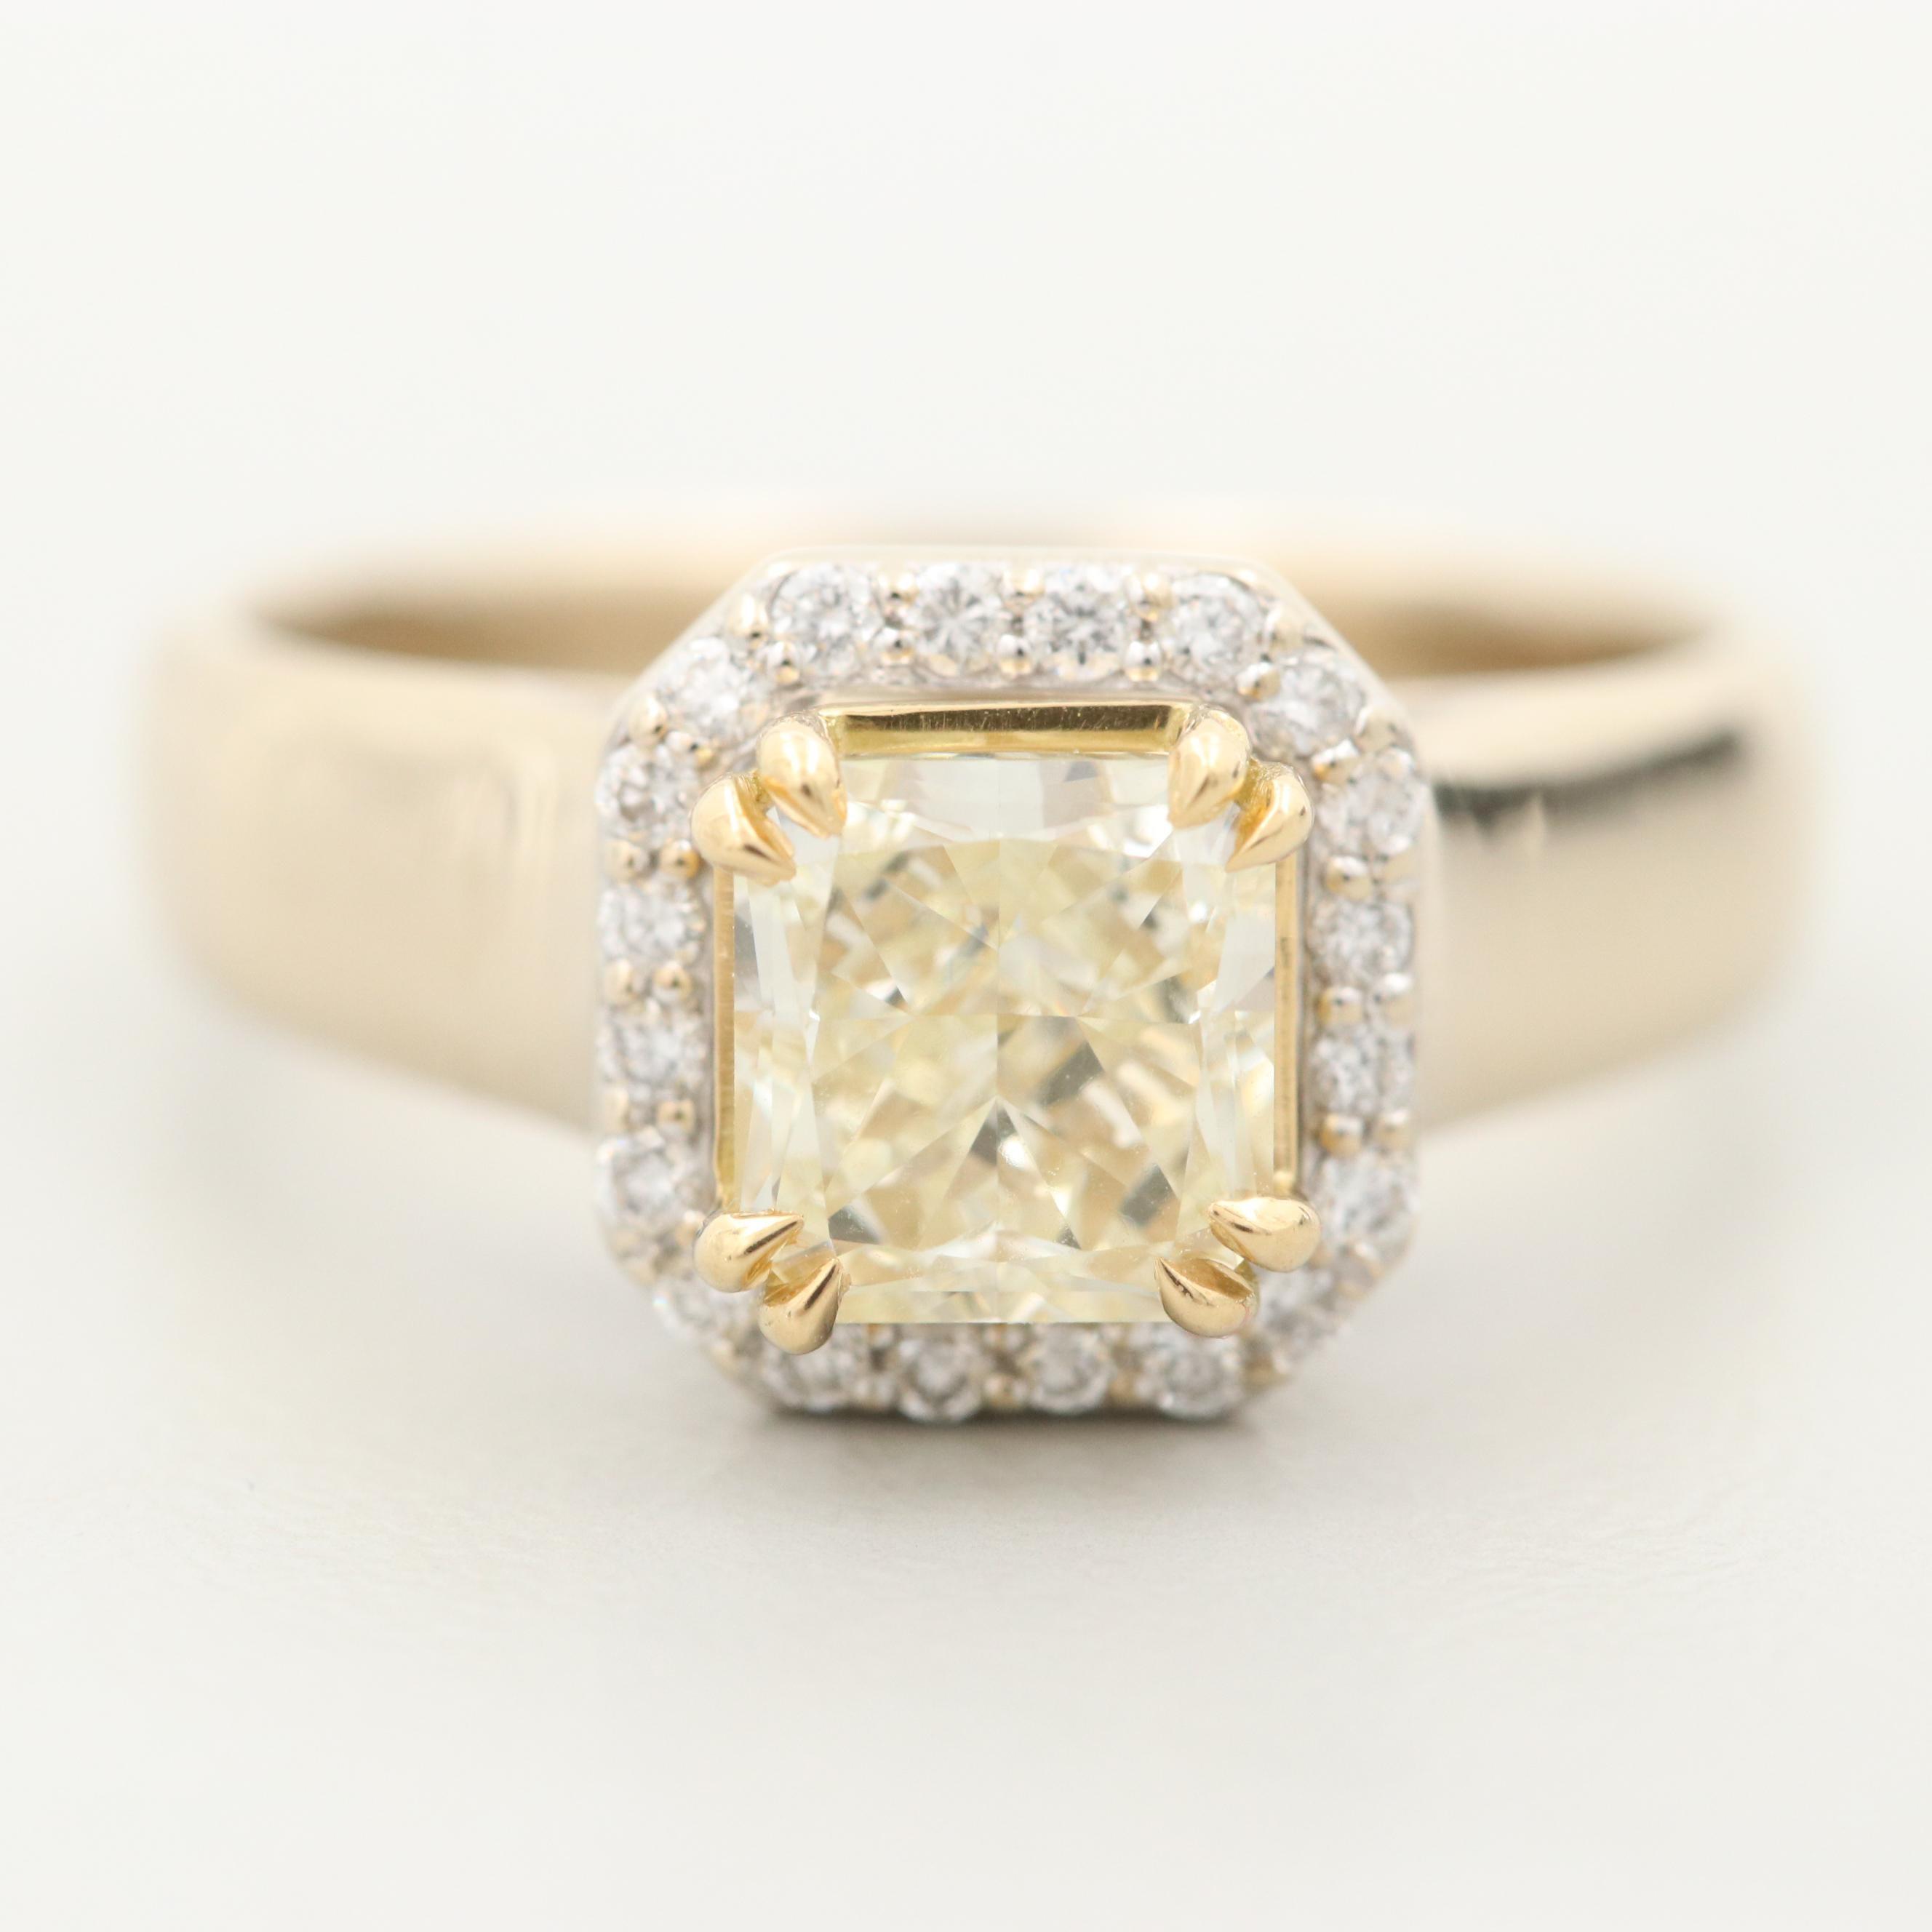 18K Yellow Gold 1.22 CTW Diamond Ring